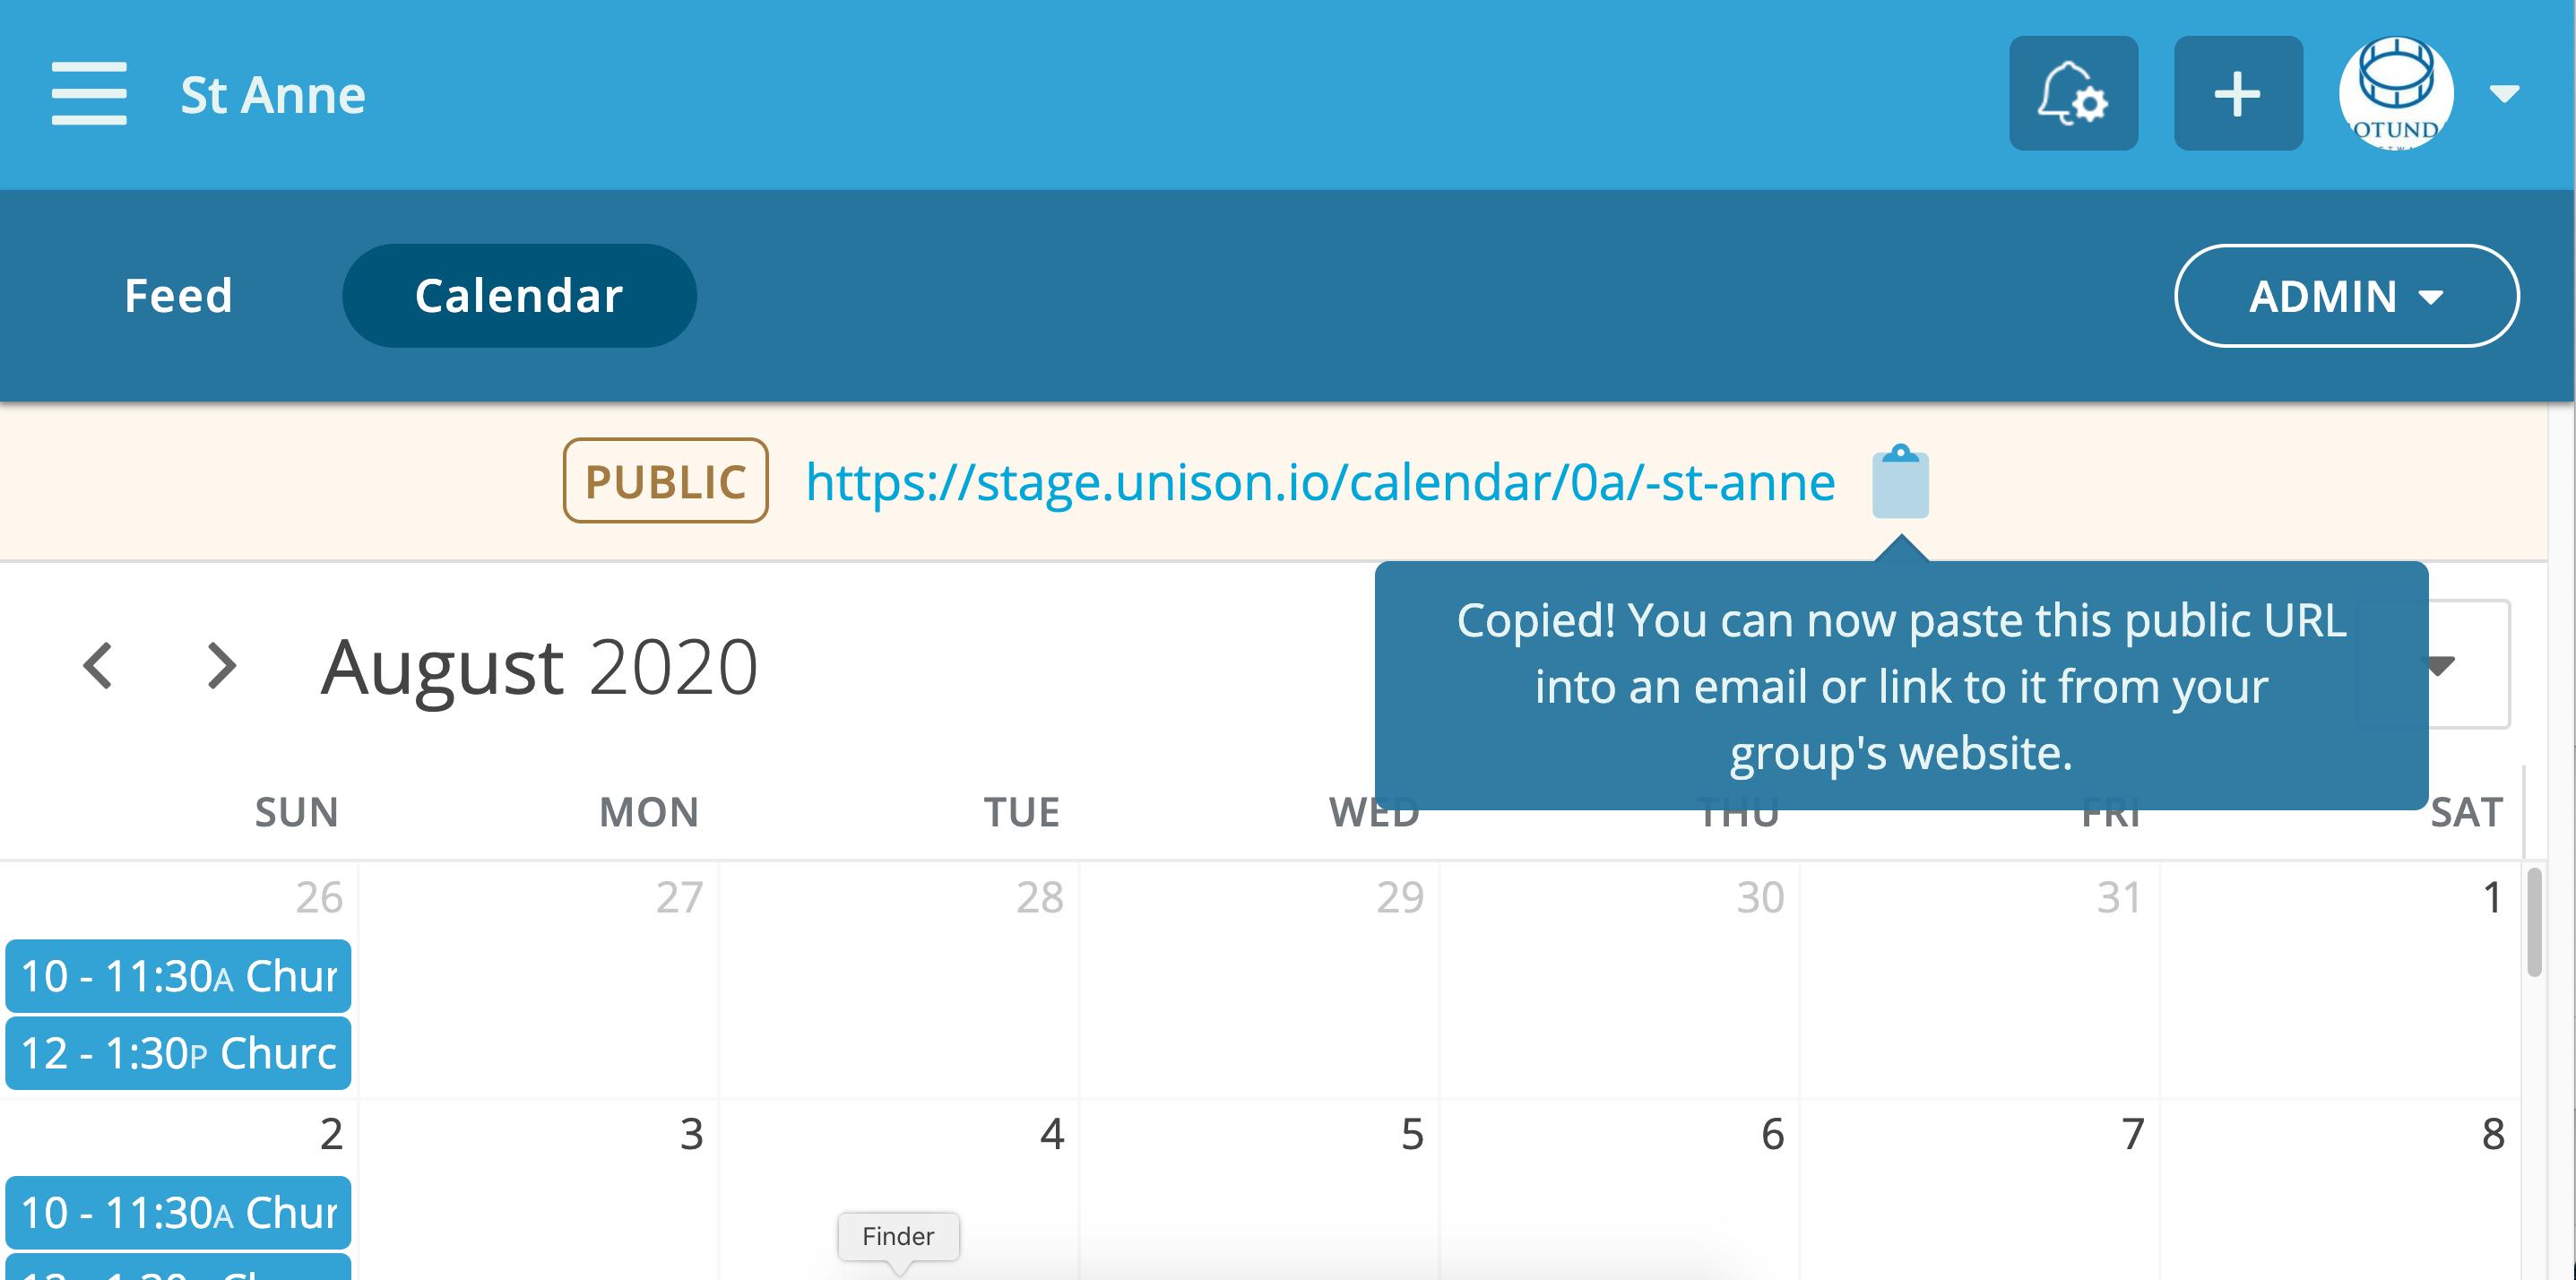 Share your calendar